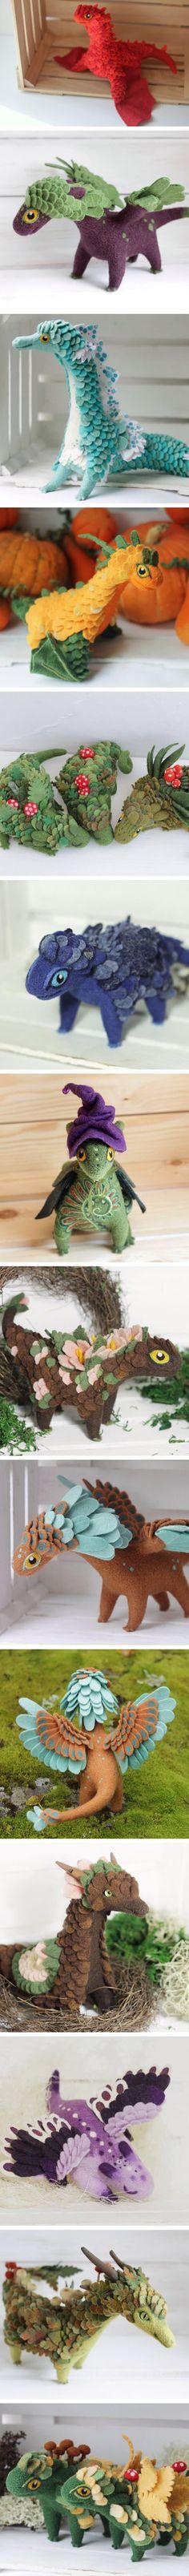 These felt dragons are wonderfully made. (By Alena Bobrova) - 9GAG